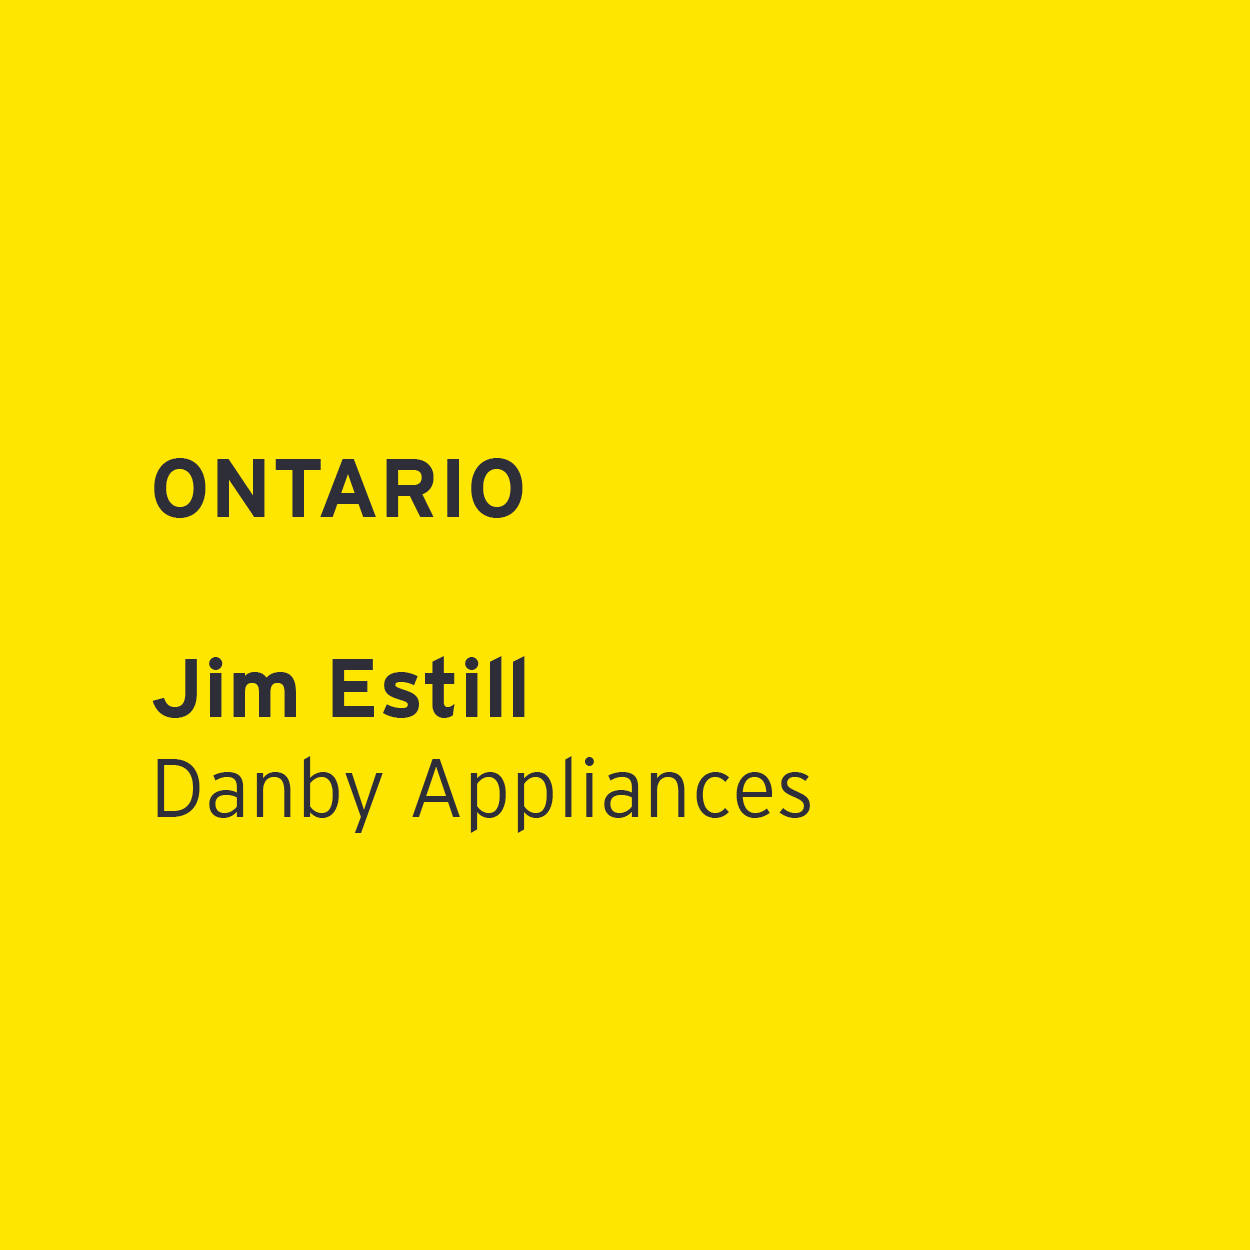 Jim Estill - Danby Appliances